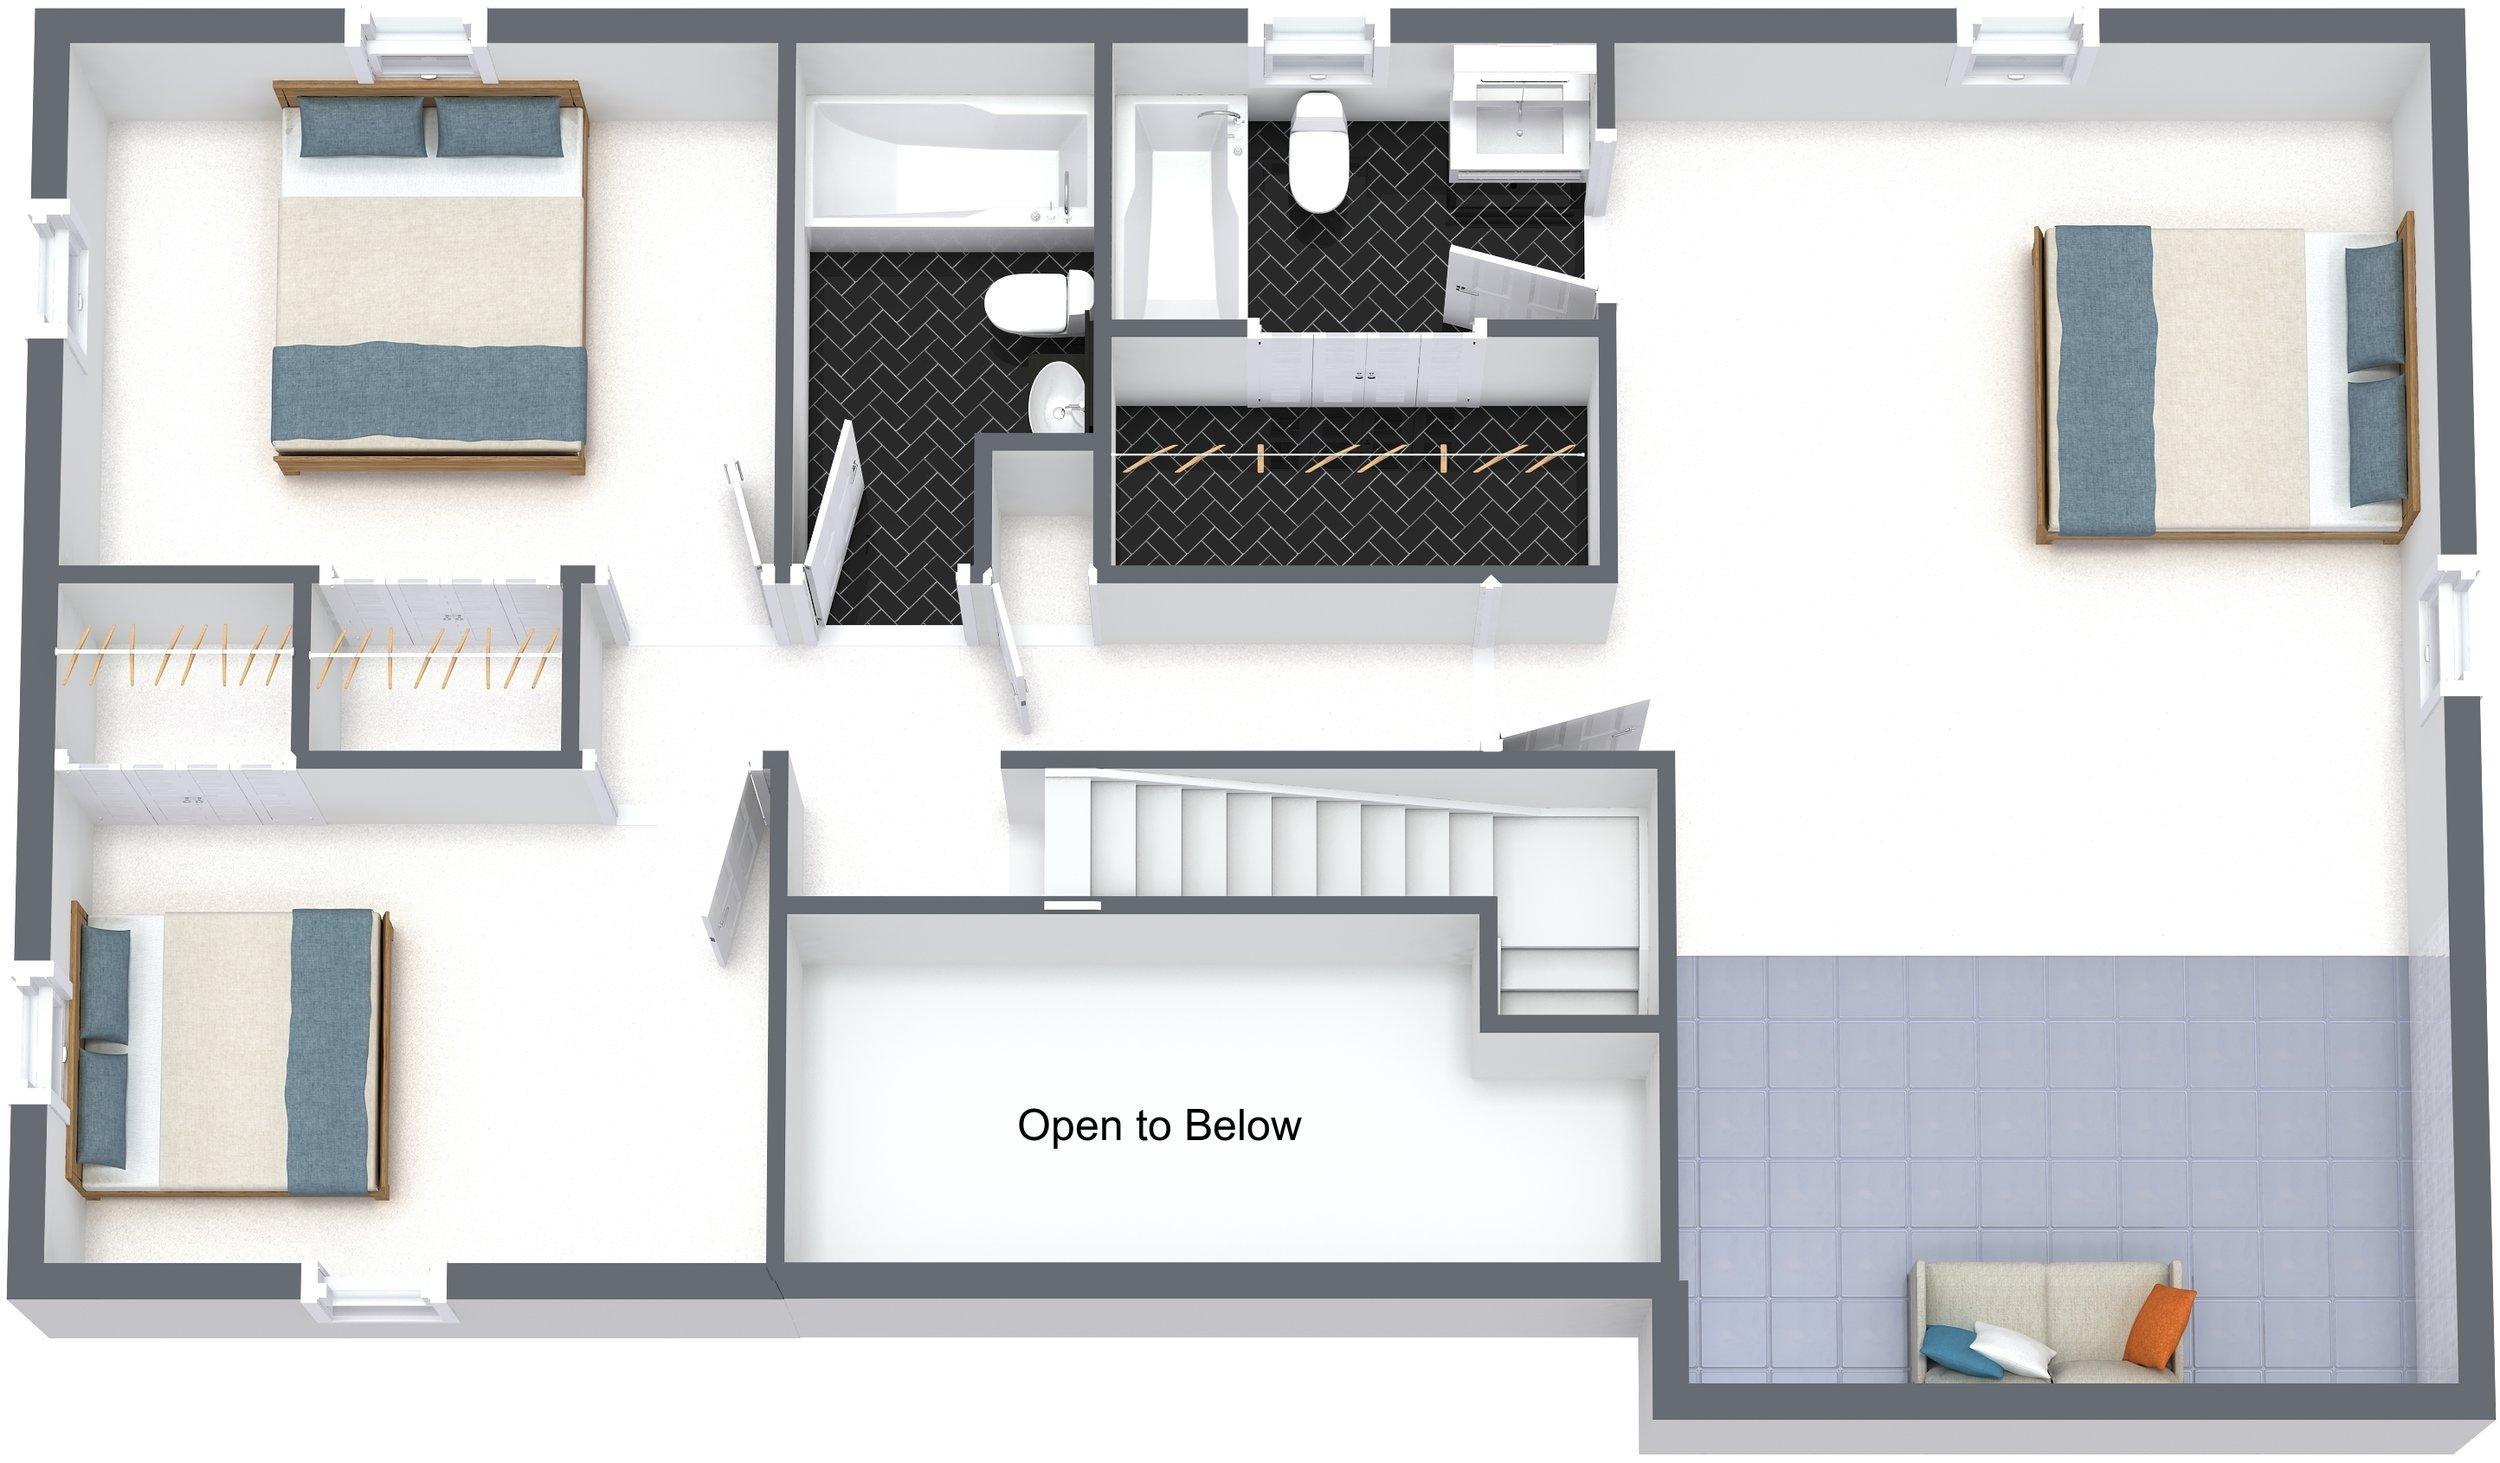 3080 South Street - 2. Floor - 3D Floor Plan.jpg